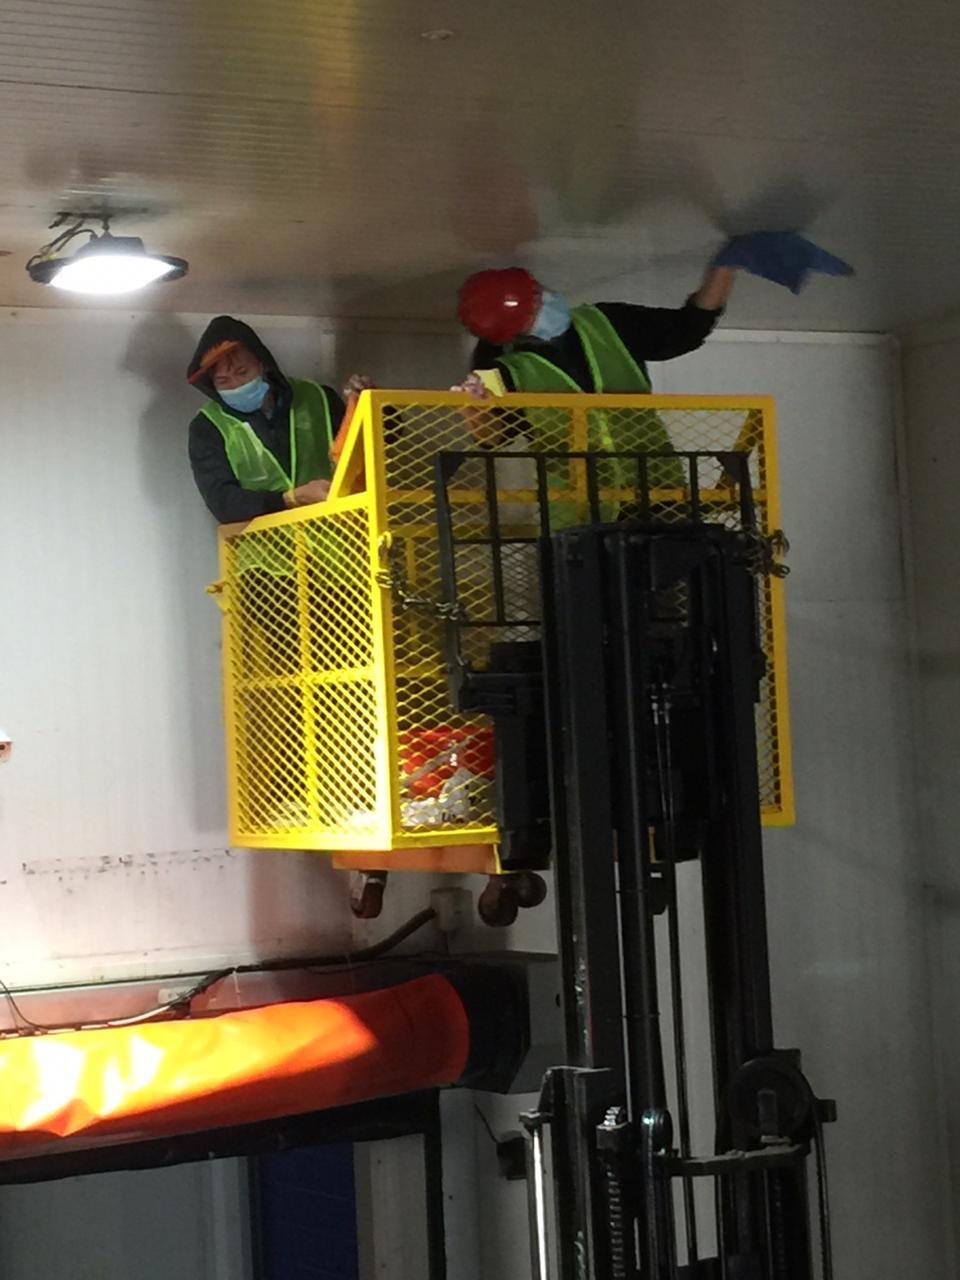 wareHouse Cleaning Dubai